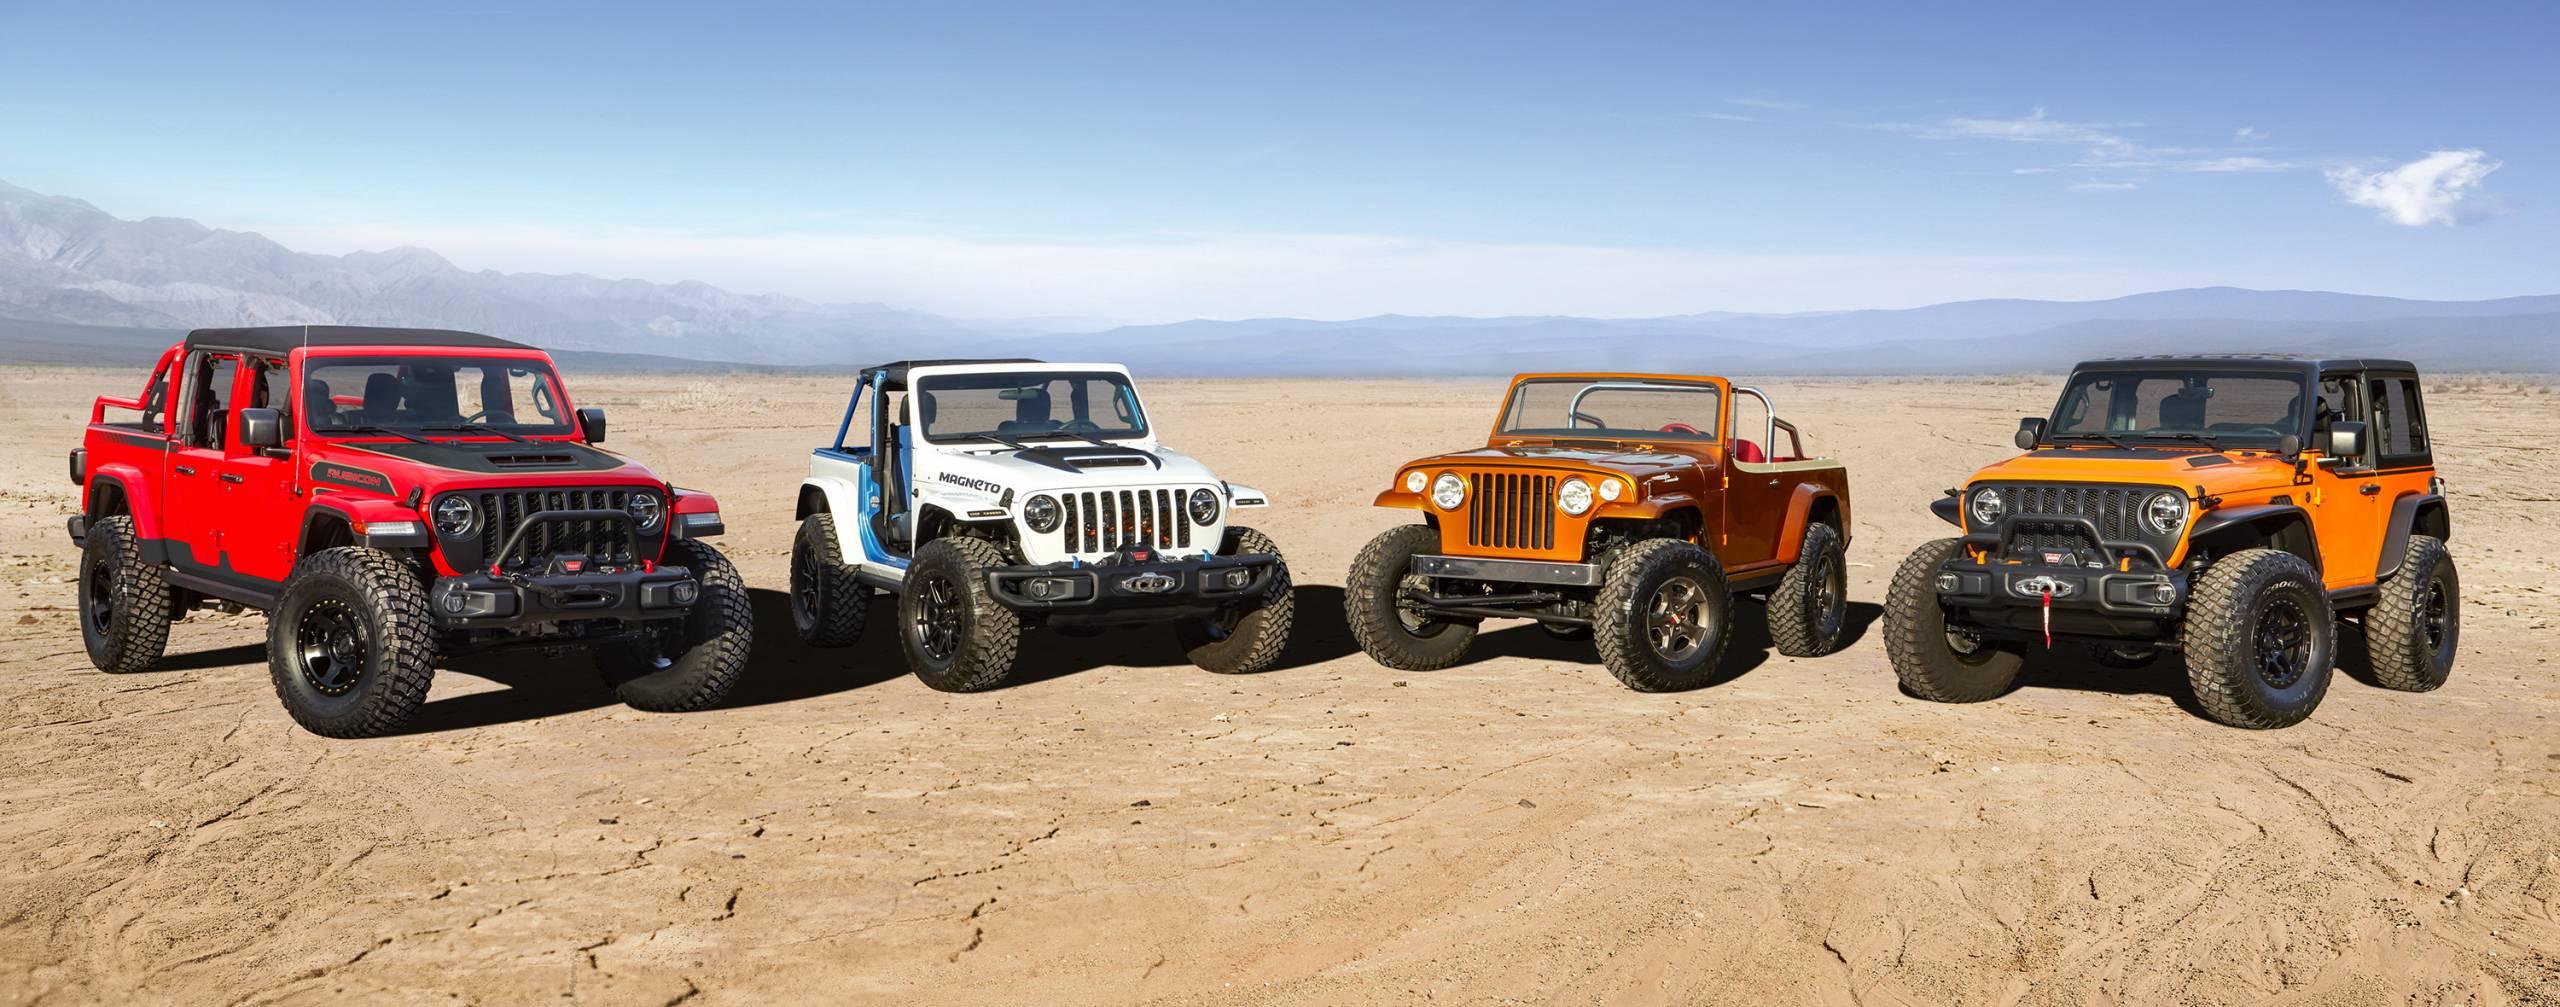 2021 Easter Jeep Safari Jeep concept vehicles